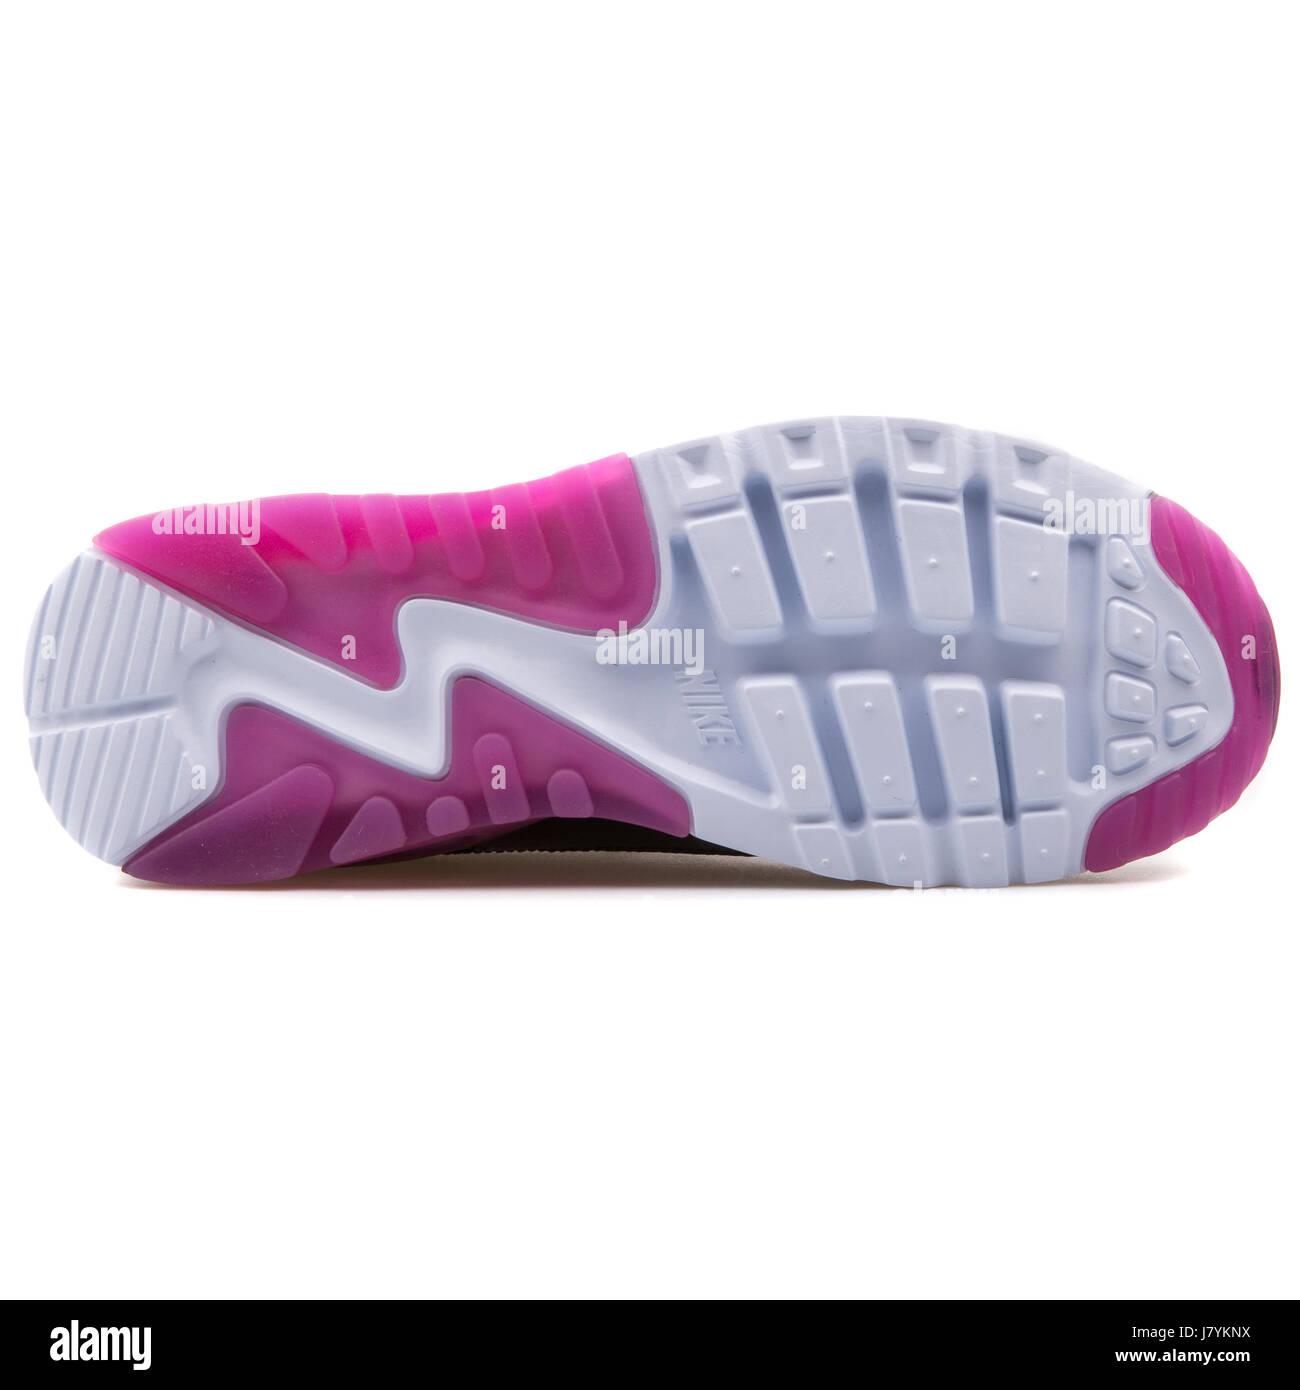 Nike W Air Max 90 Ultra Essential Women's Black and Purple